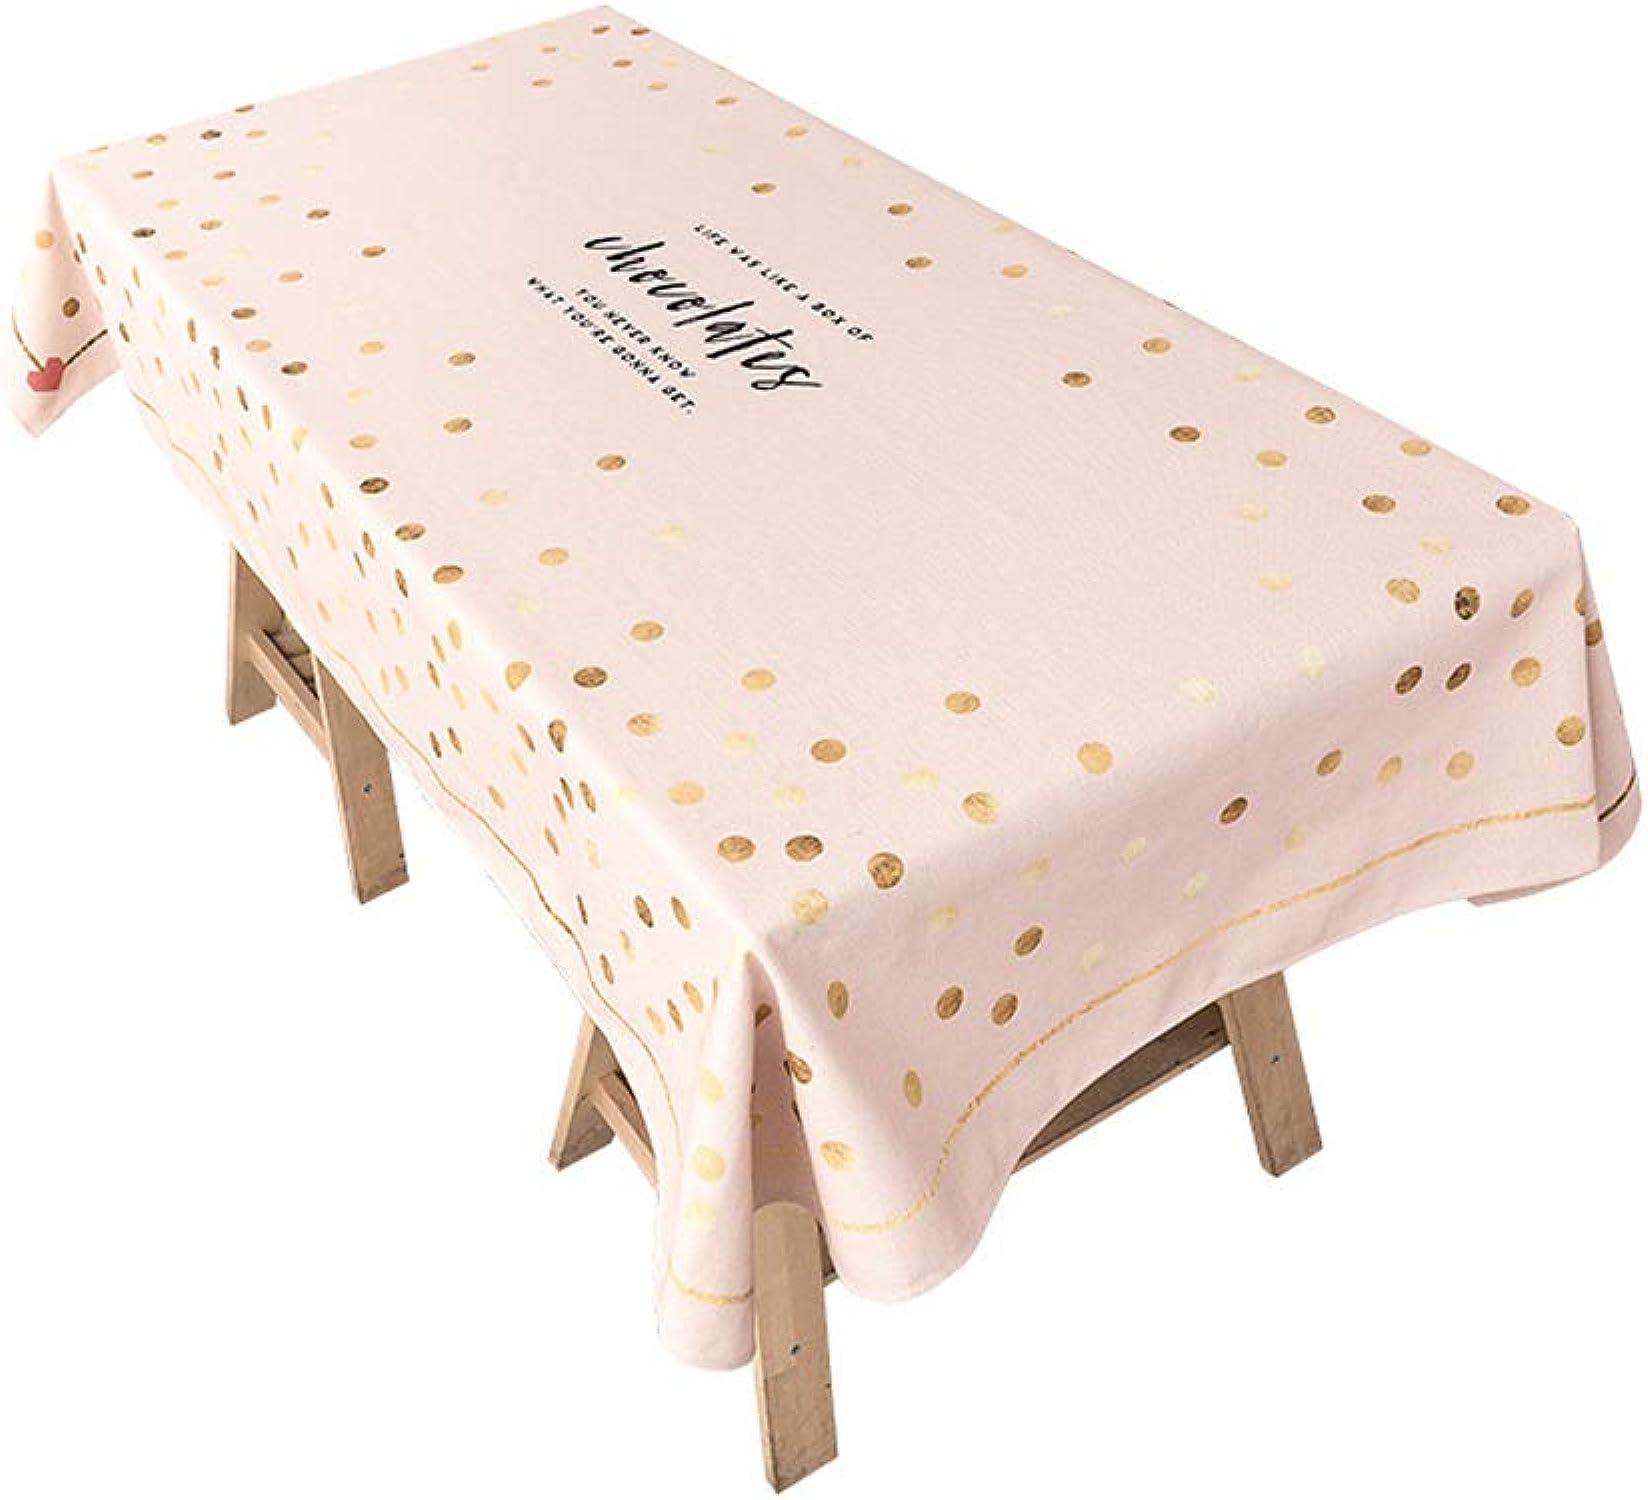 HY Manteles Mezclados, Manteles rectangulares de Estilo nórdico, Telas de Mesa de café Antiarrugas de Estilo Americano, 140x180CM, C